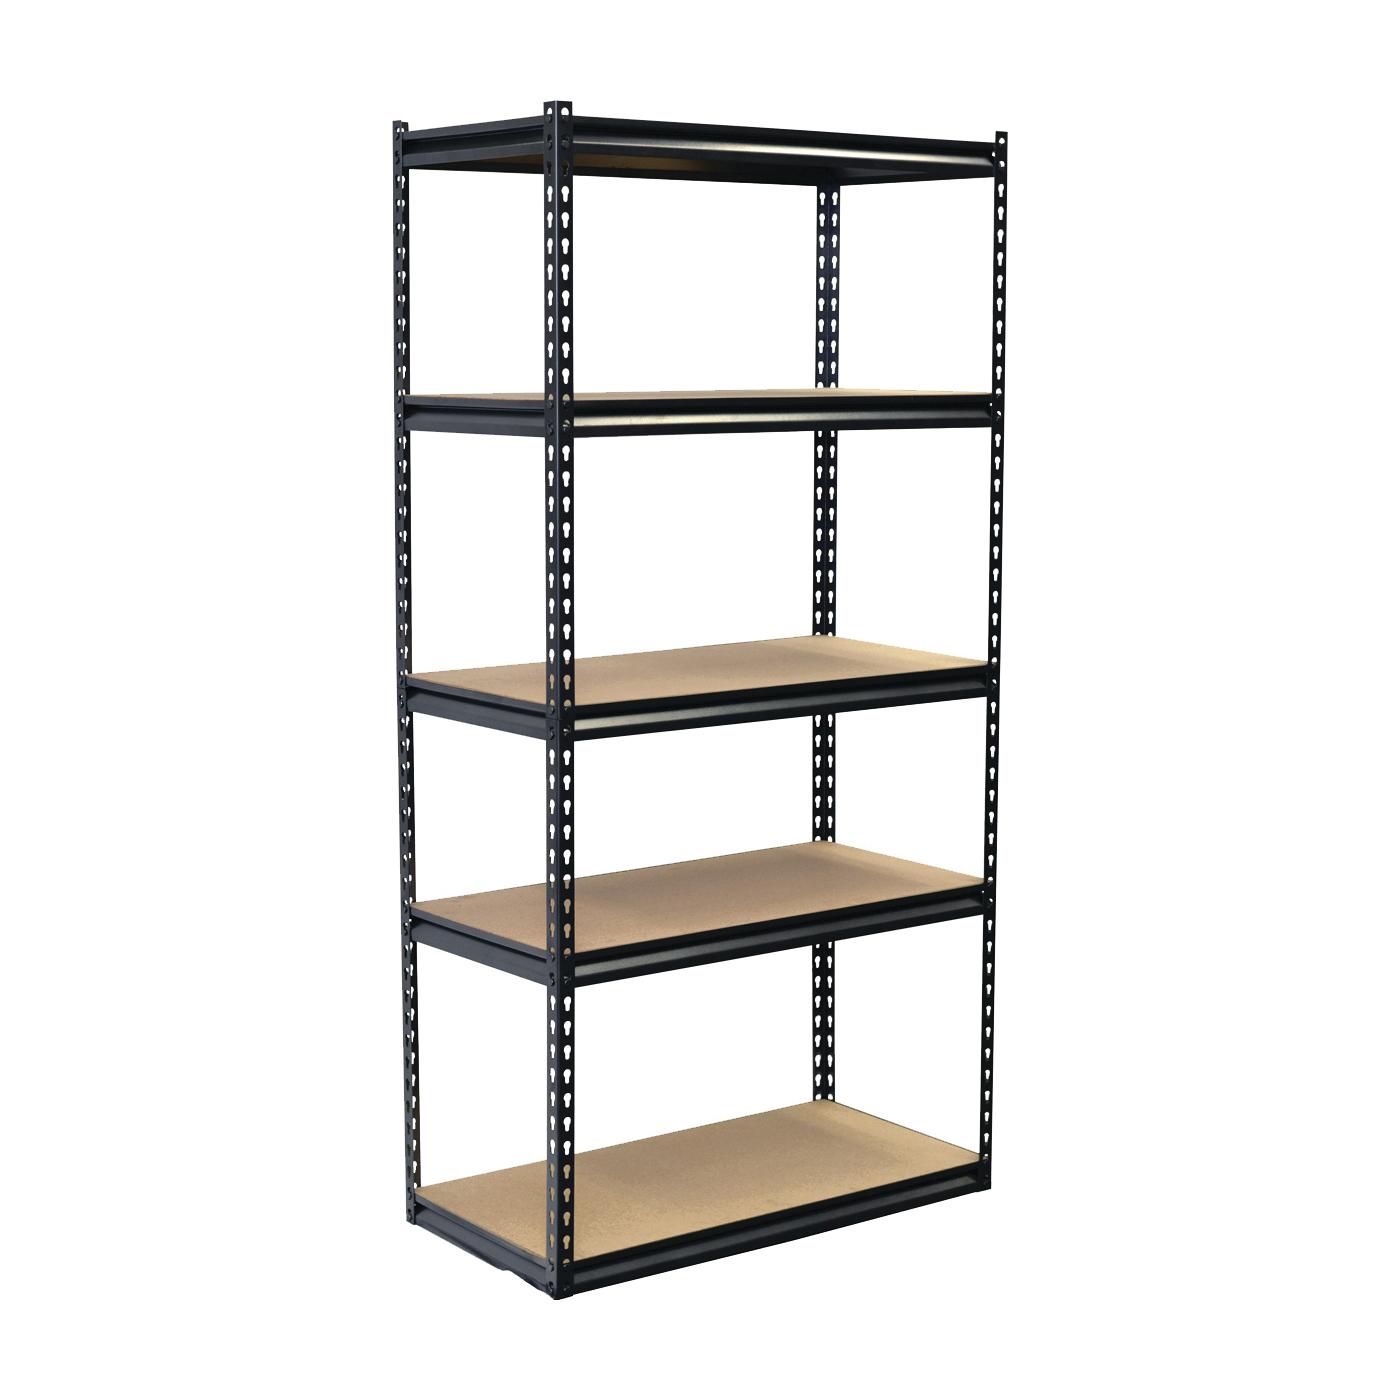 Storage Concepts SCB1505W